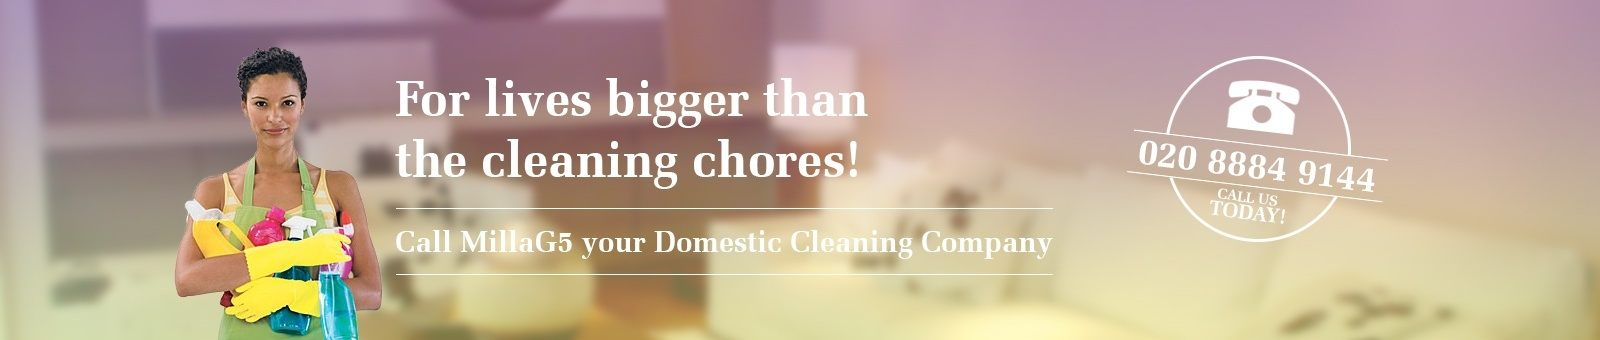 MillaG5 Cleaning Agency Slide